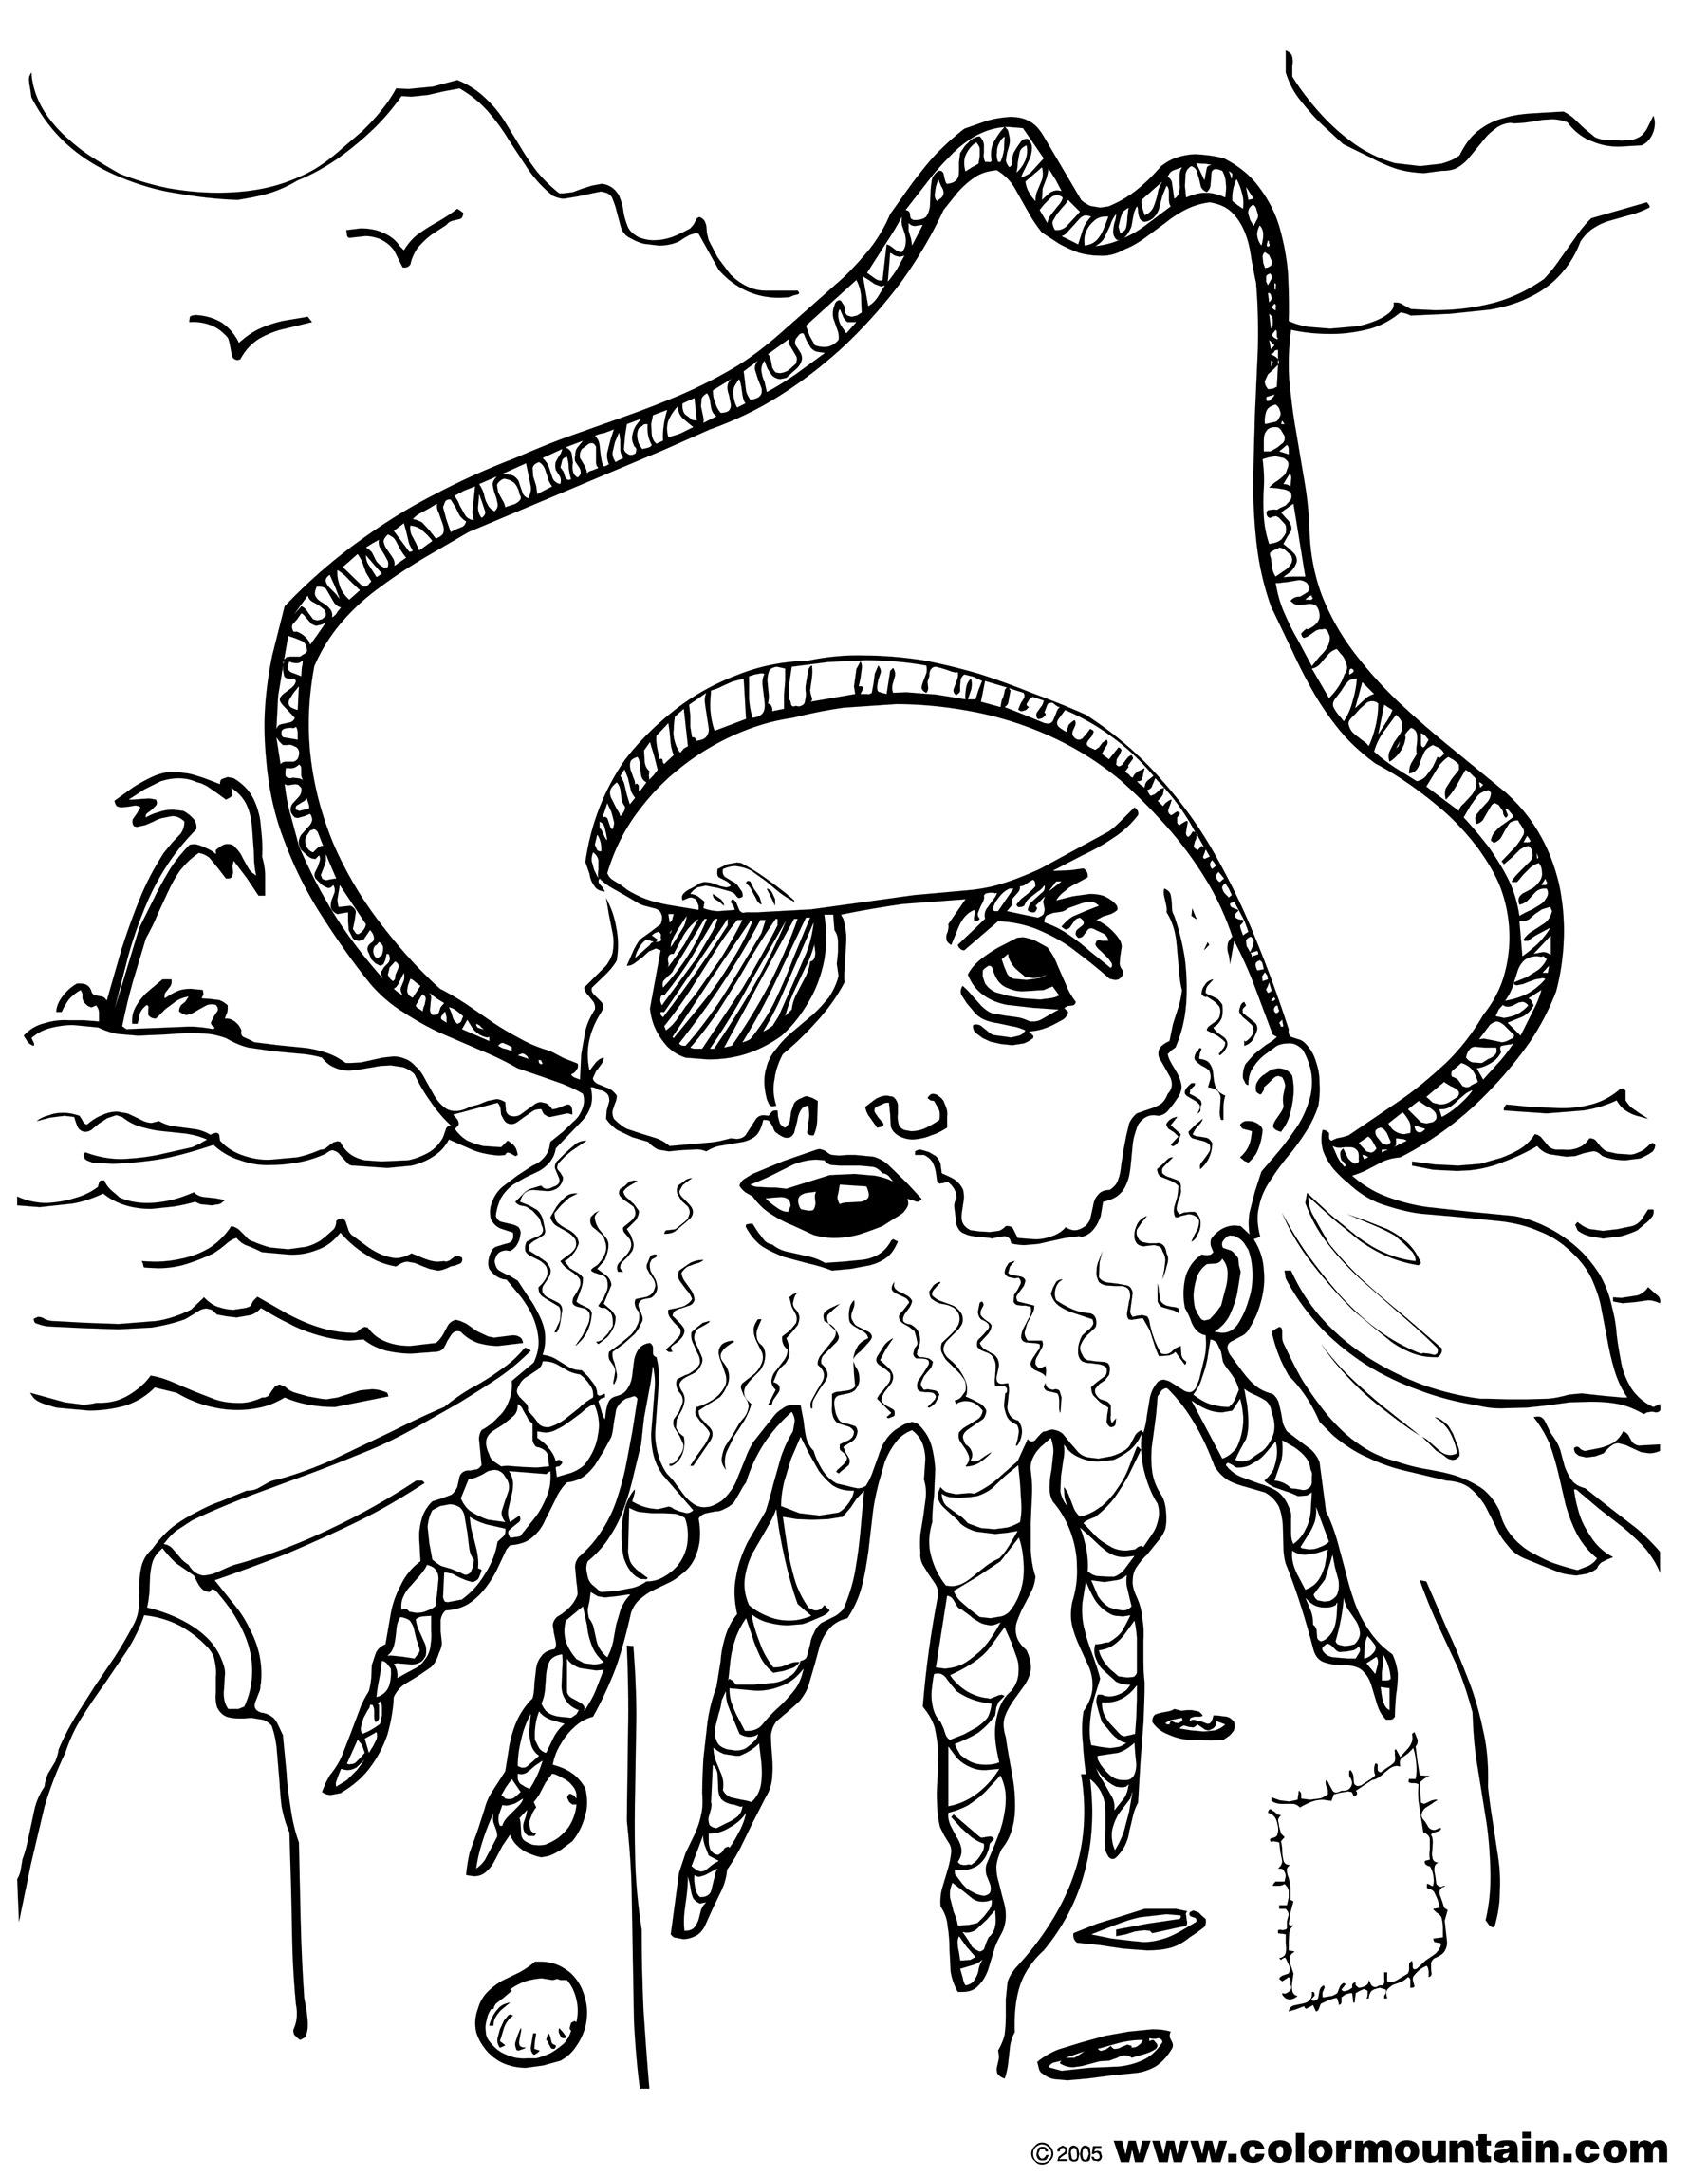 Blackbeard Drawing At Getdrawings